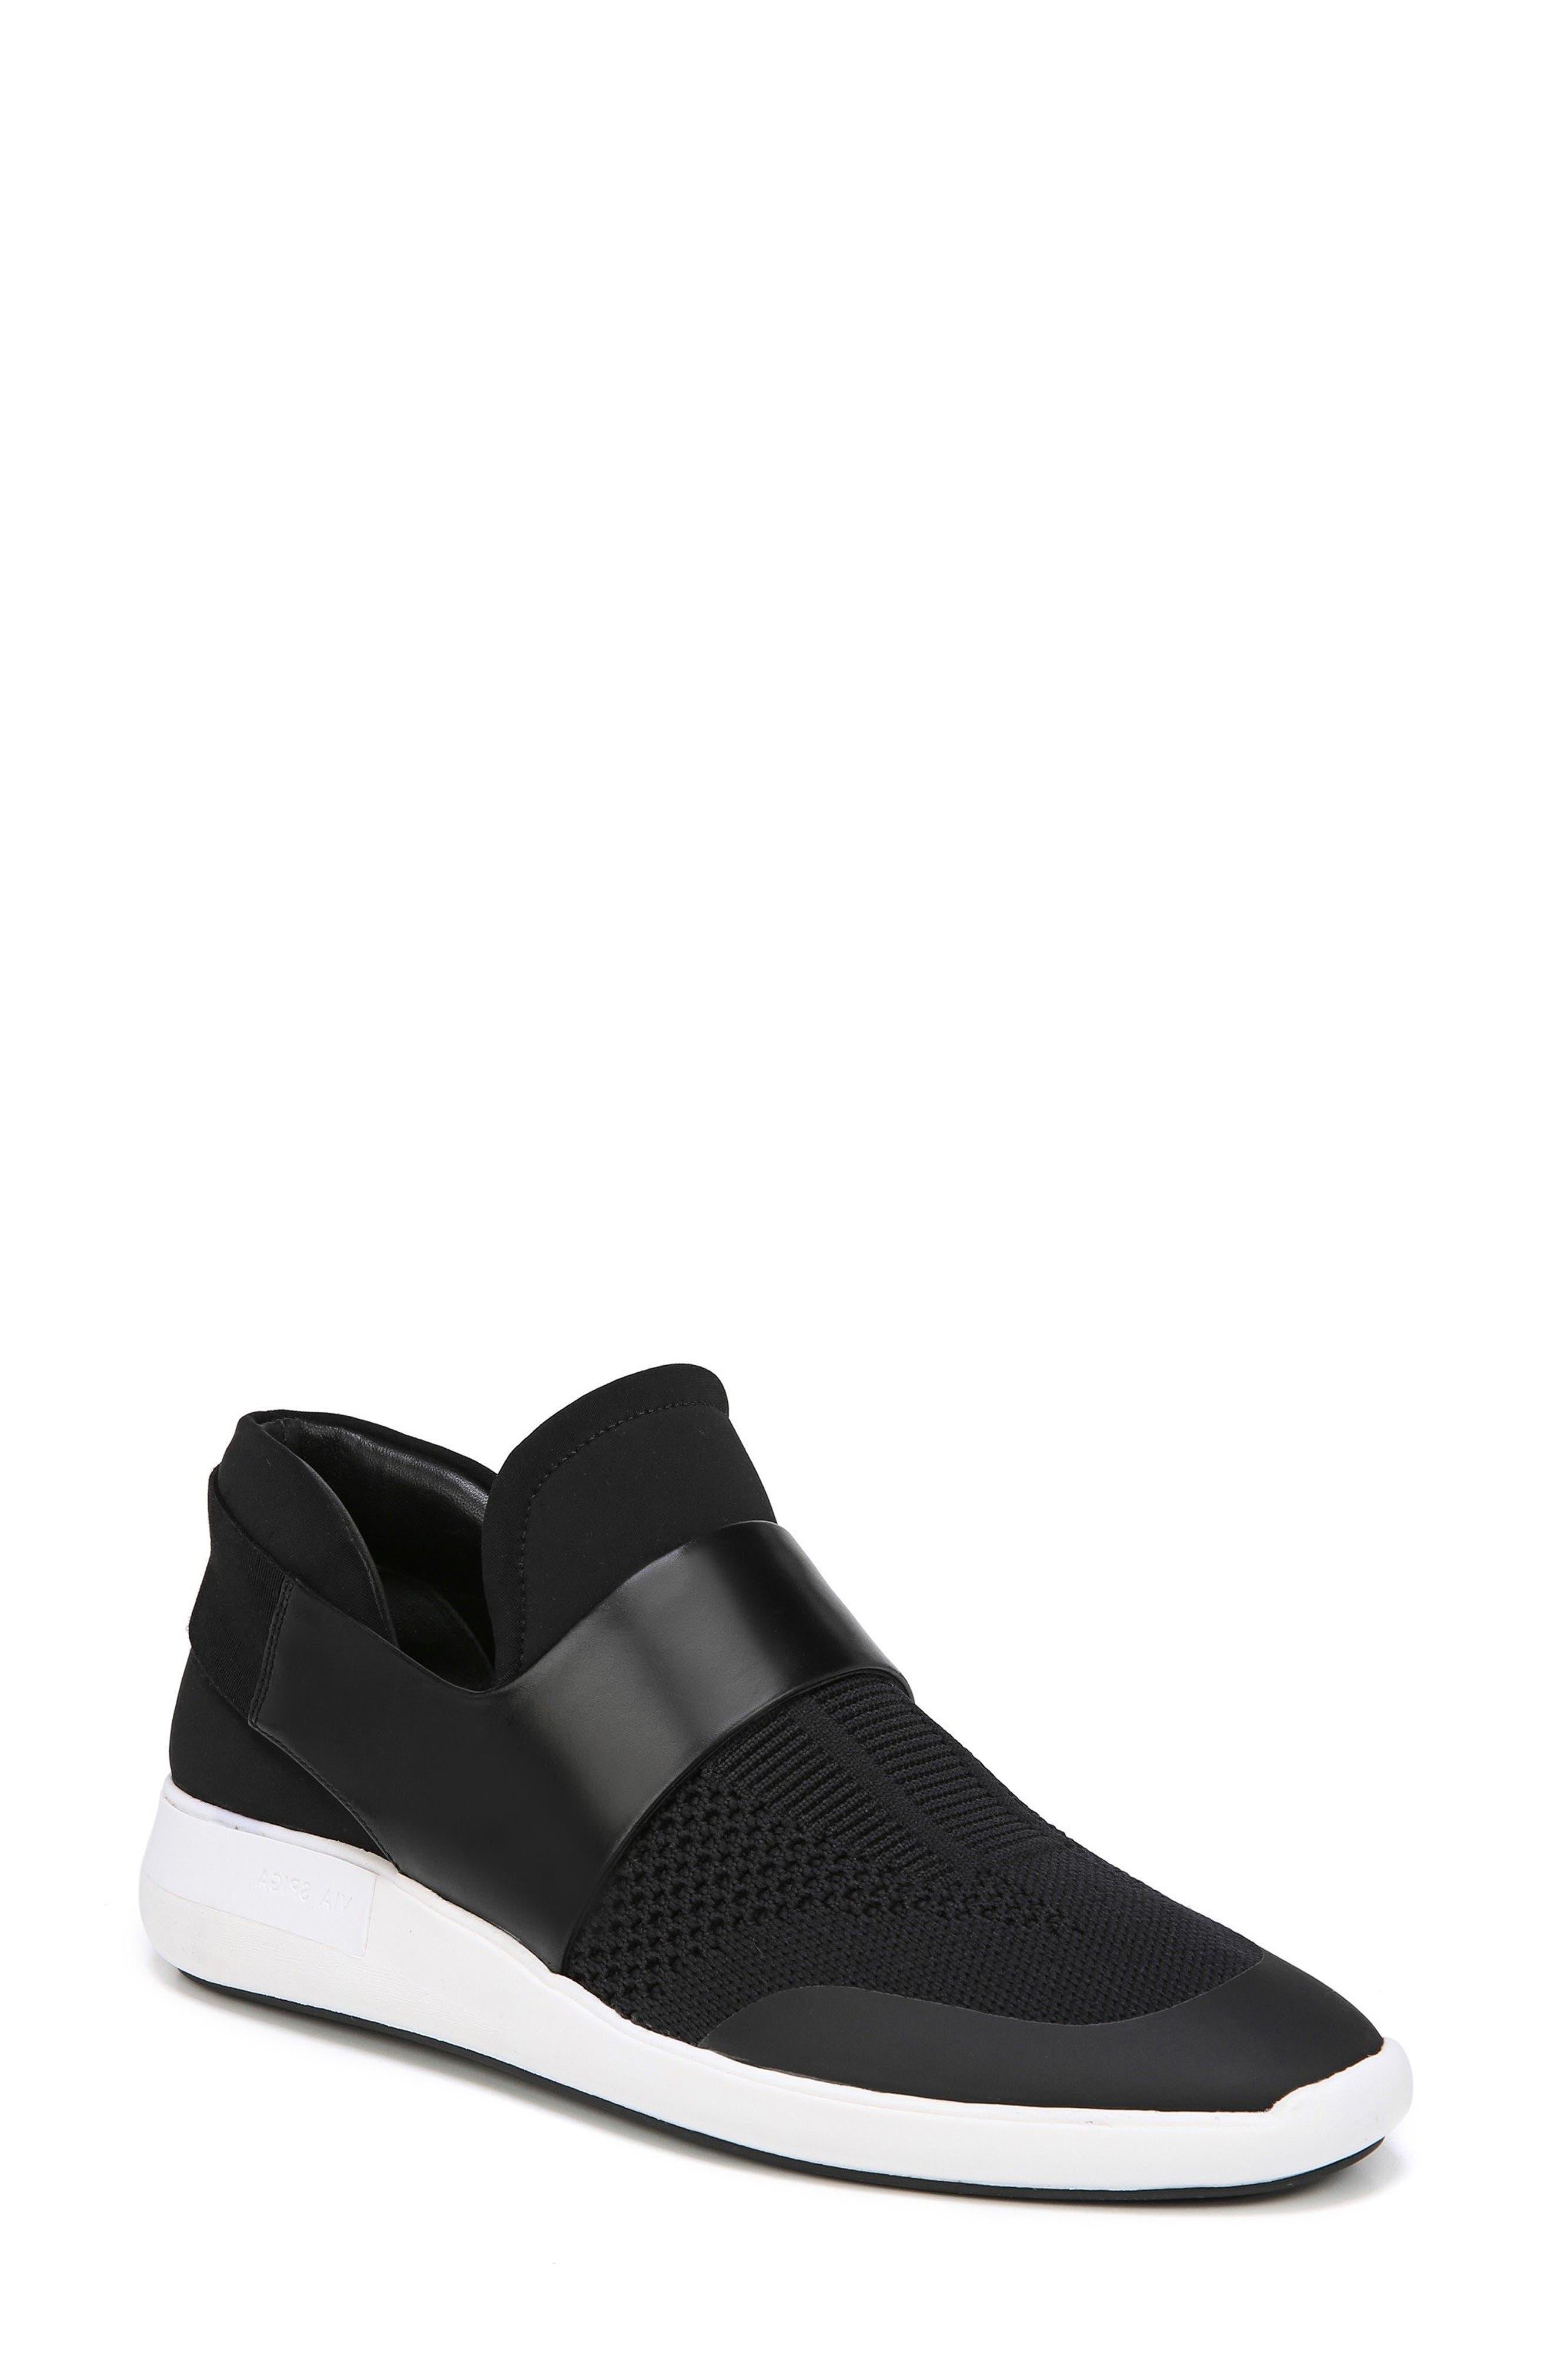 Misha Slip-On Sneaker,                             Main thumbnail 1, color,                             001